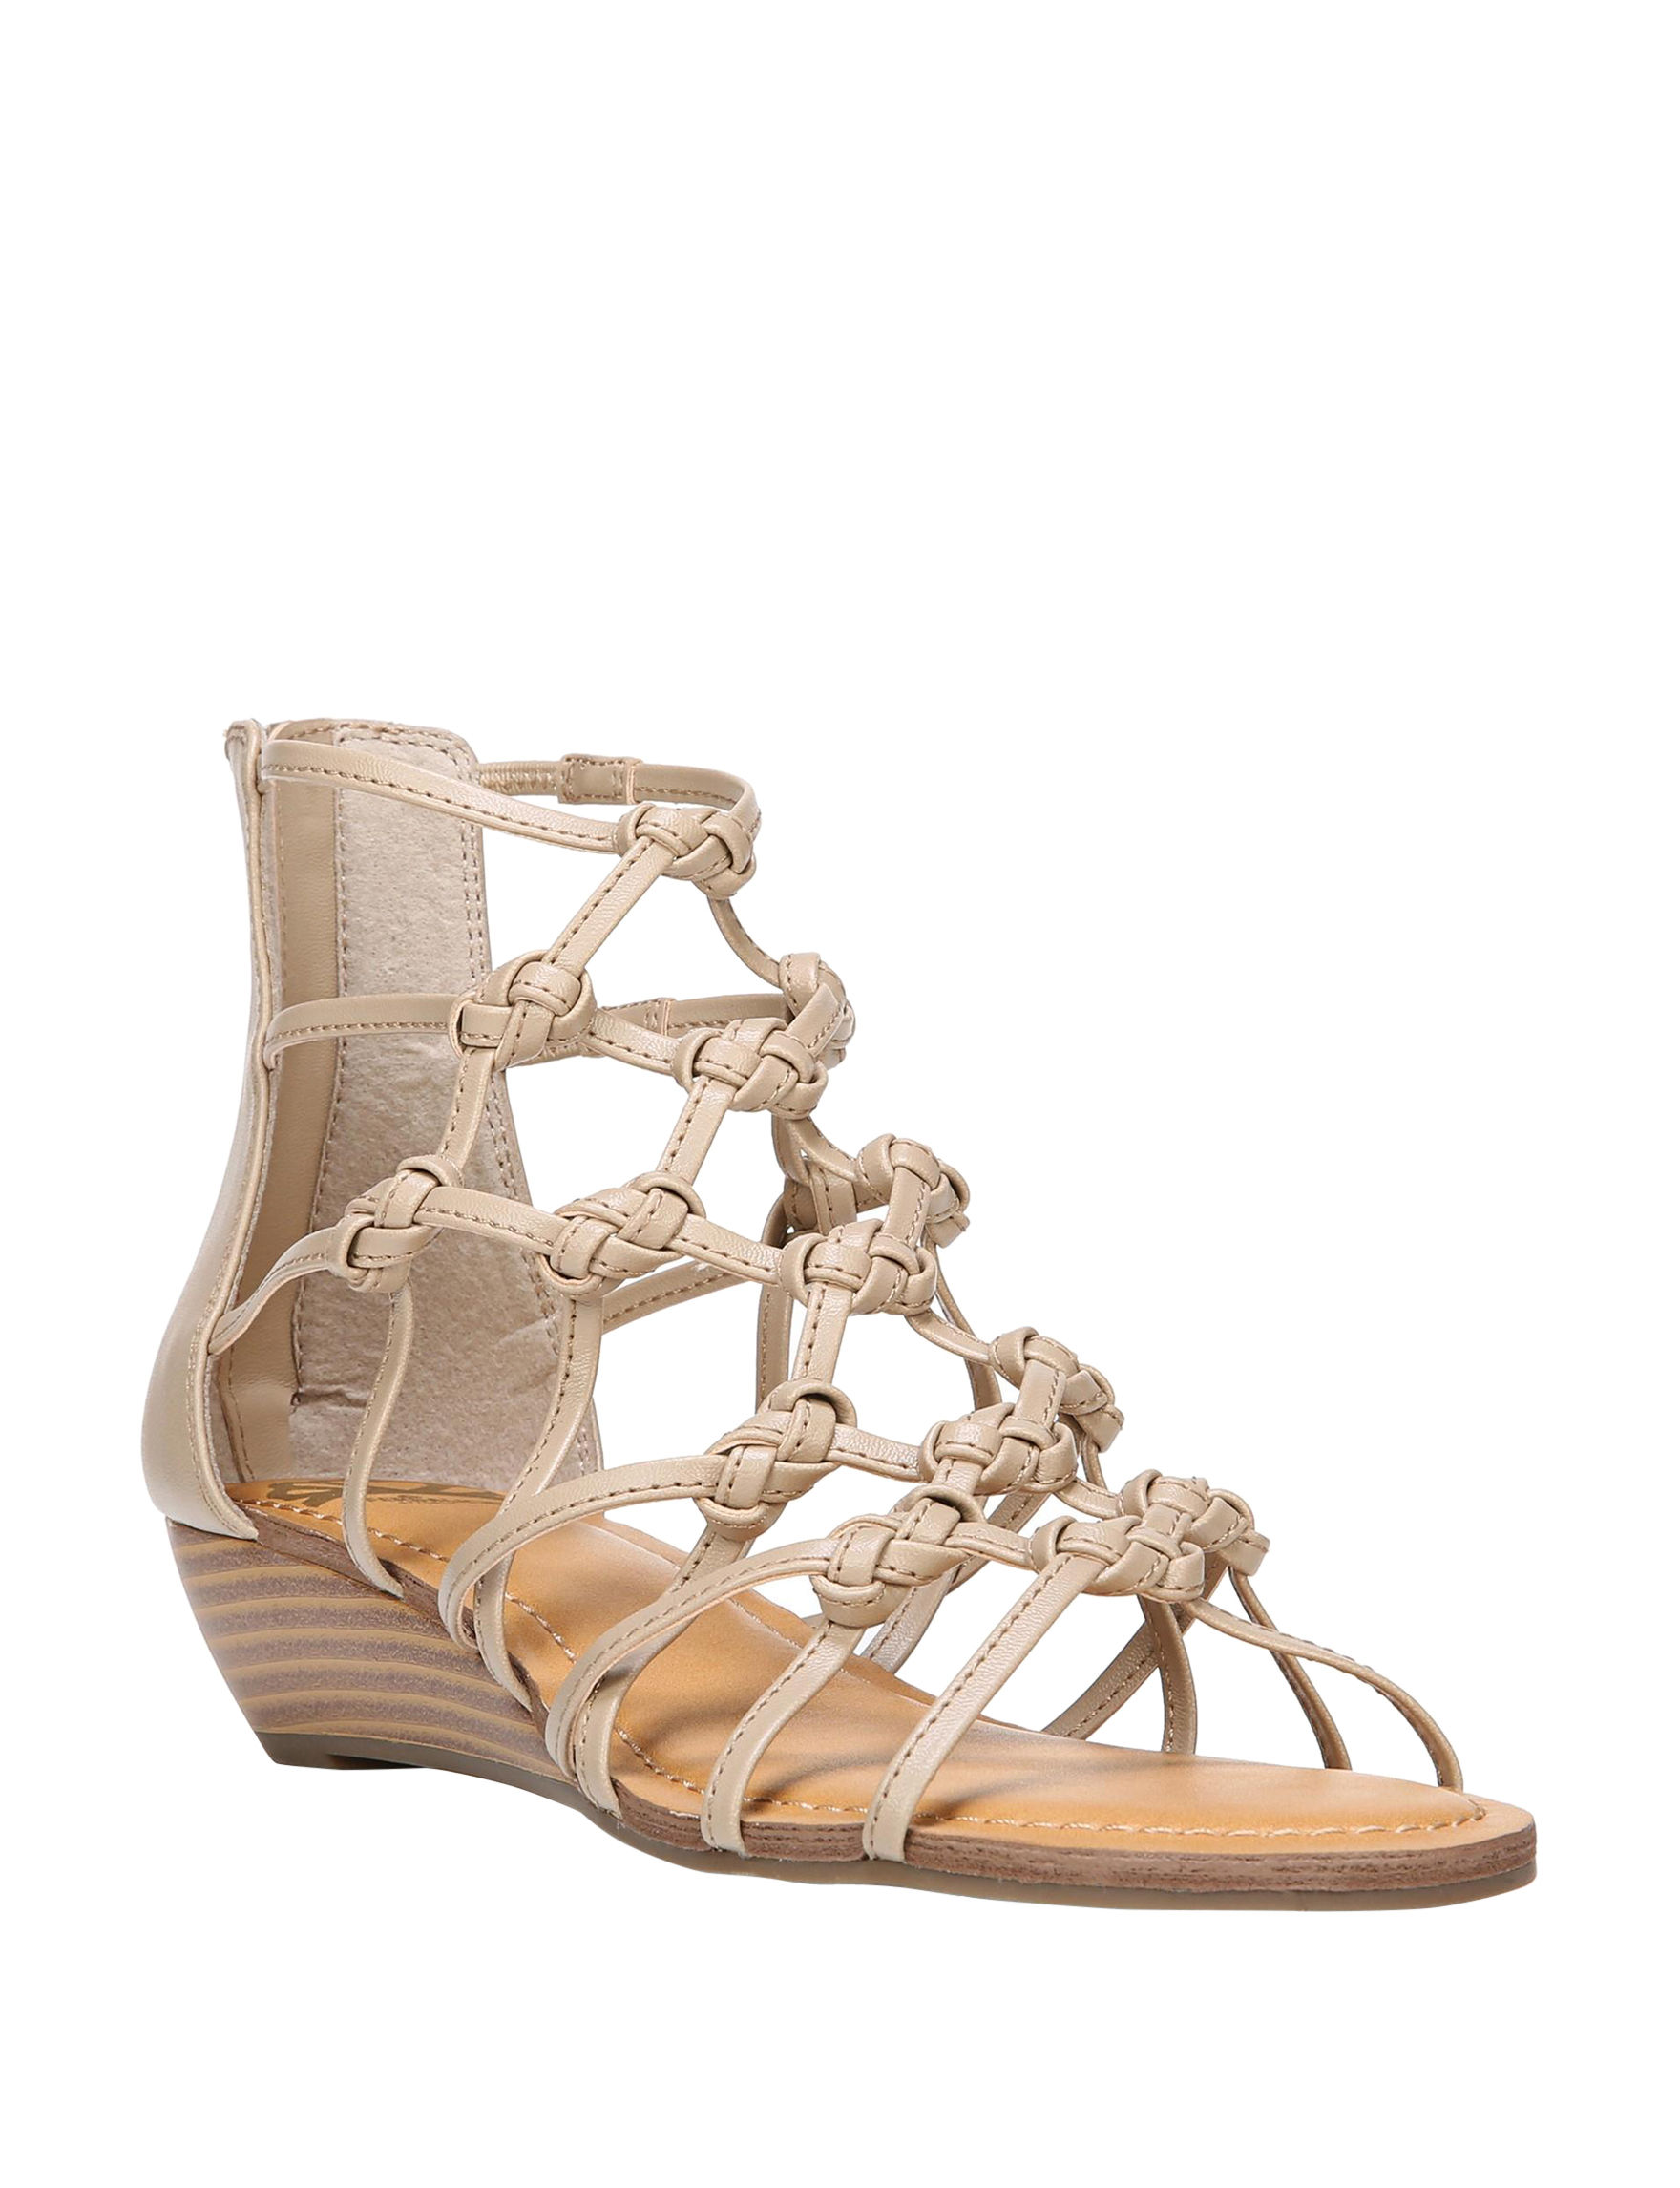 Fergalicious by Fergie Nude Gladiators Wedge Sandals